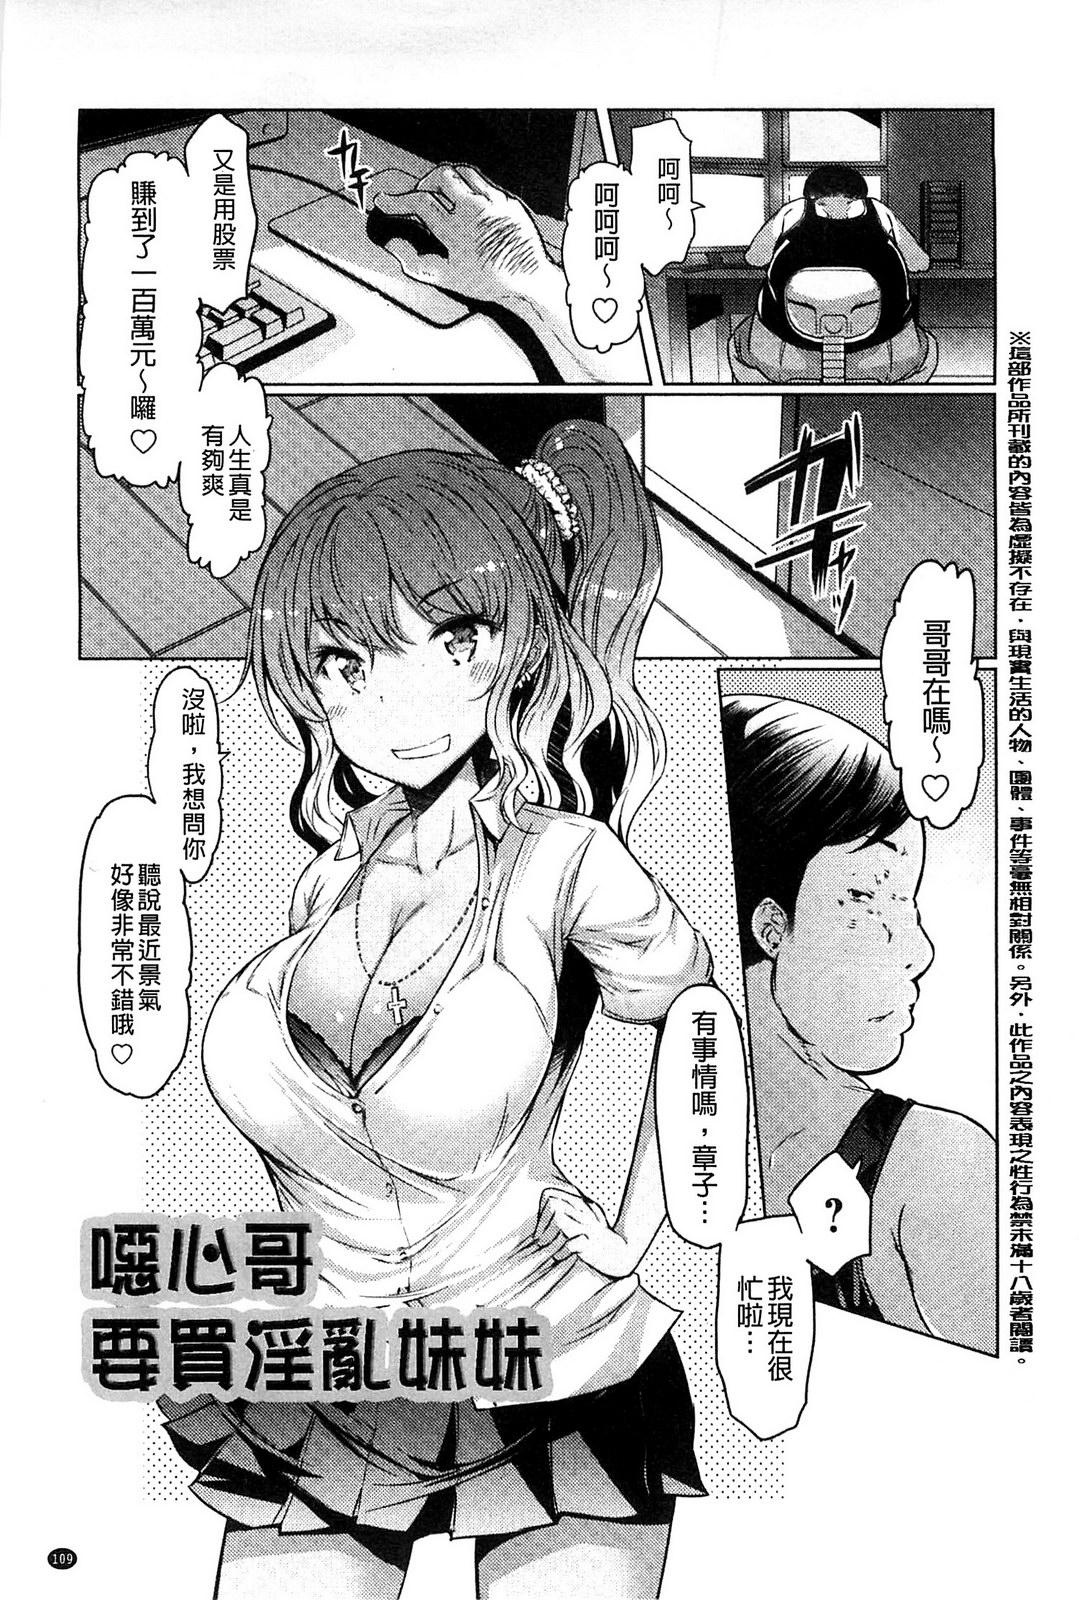 Imouto Kansatsu Nikki - The Record of Sex with My Sister 111